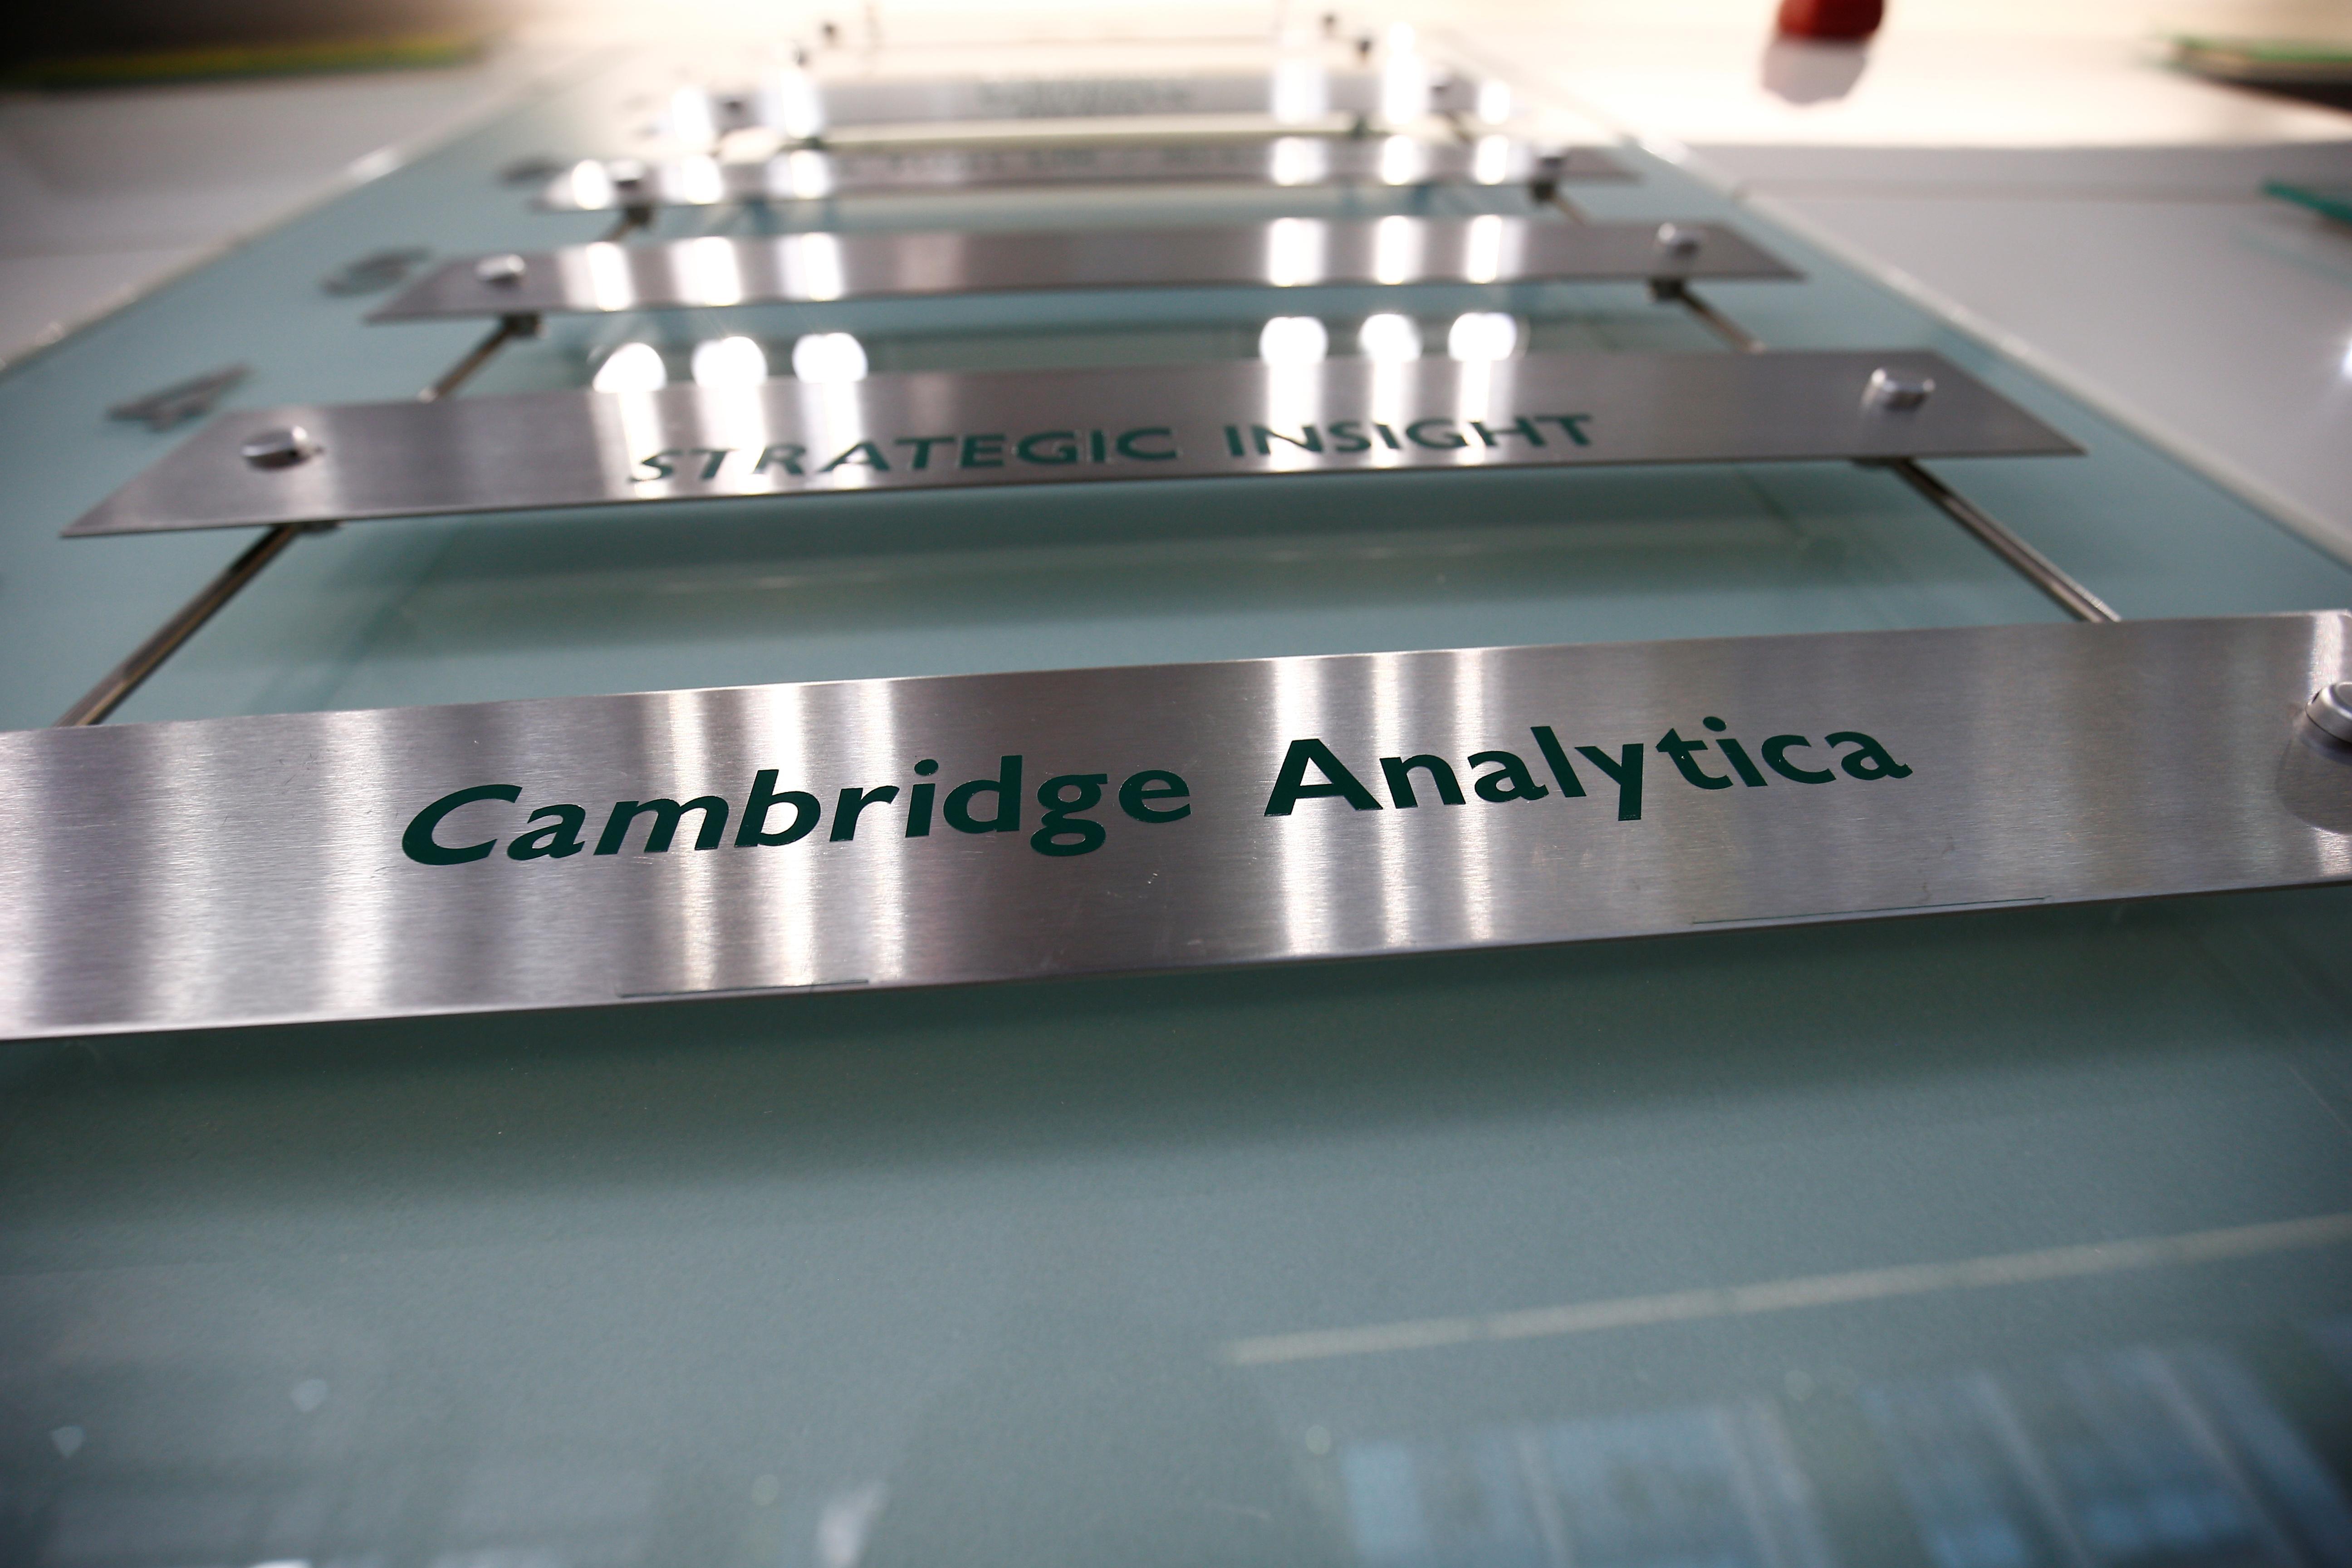 U.S. FTC finds Cambridge Analytica deceived Facebook users